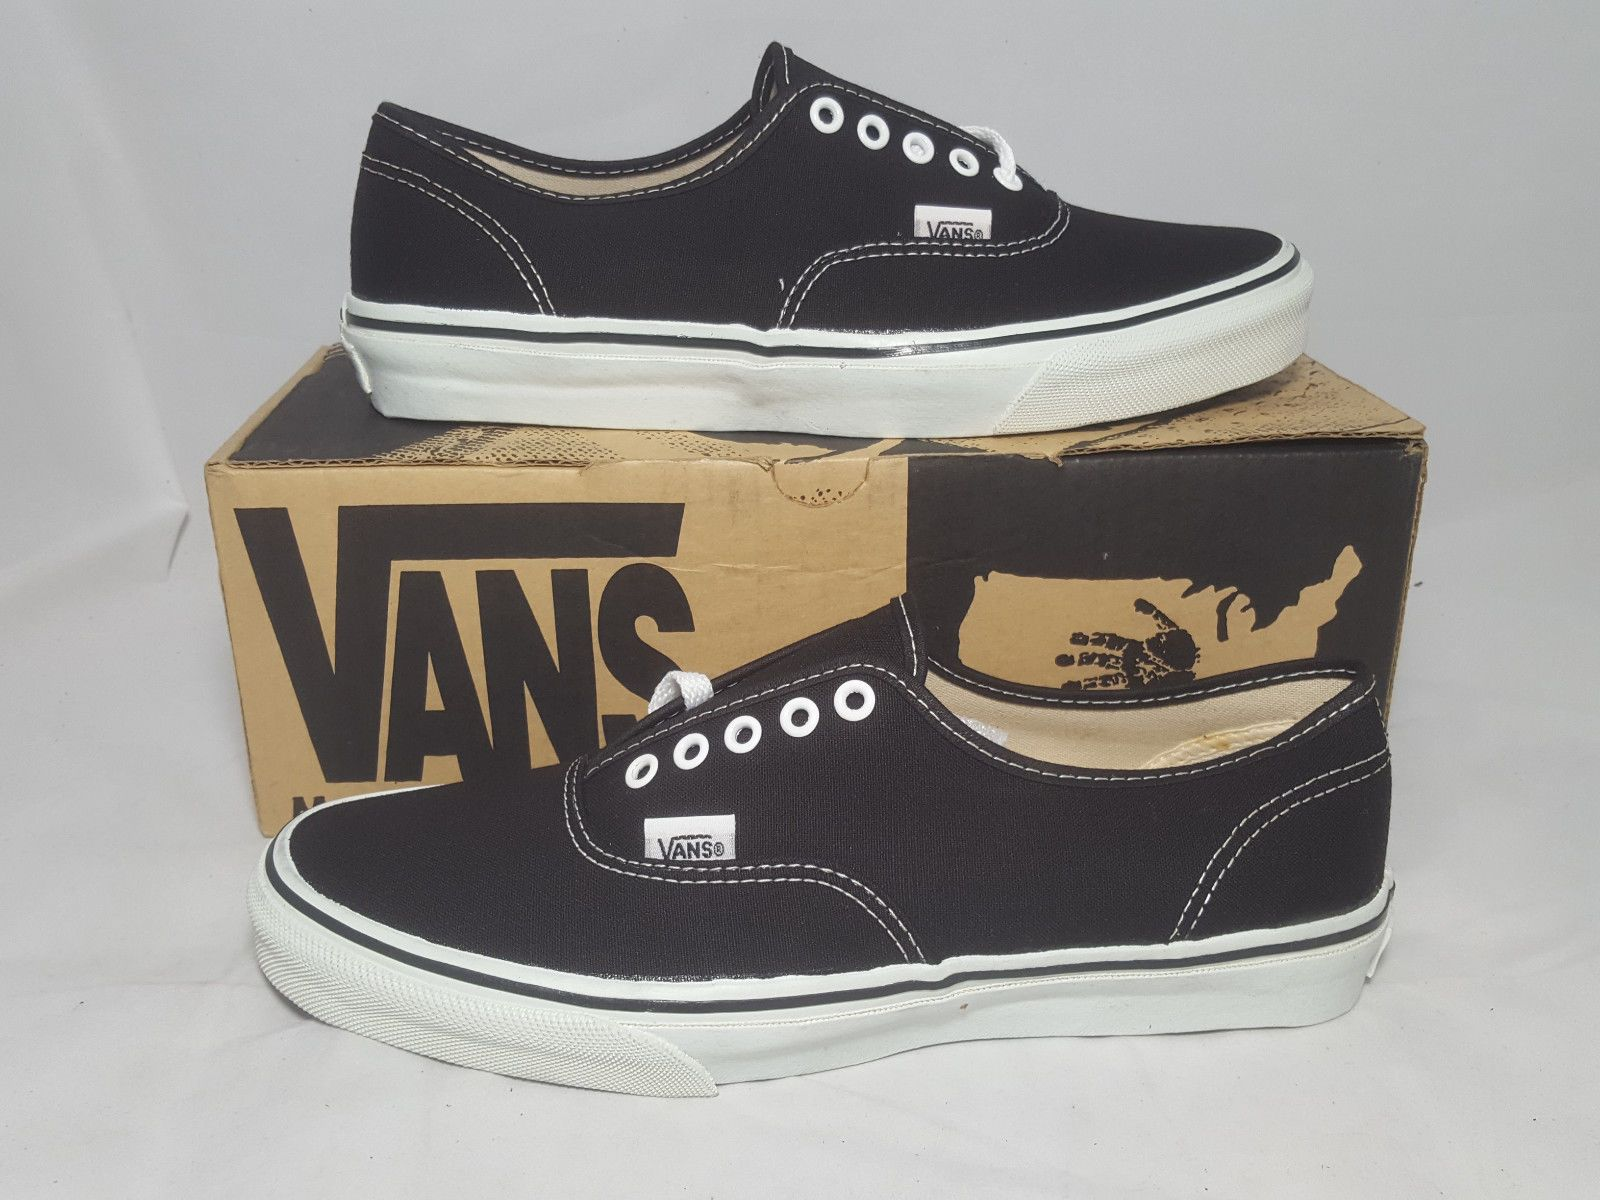 cheap vans size 10